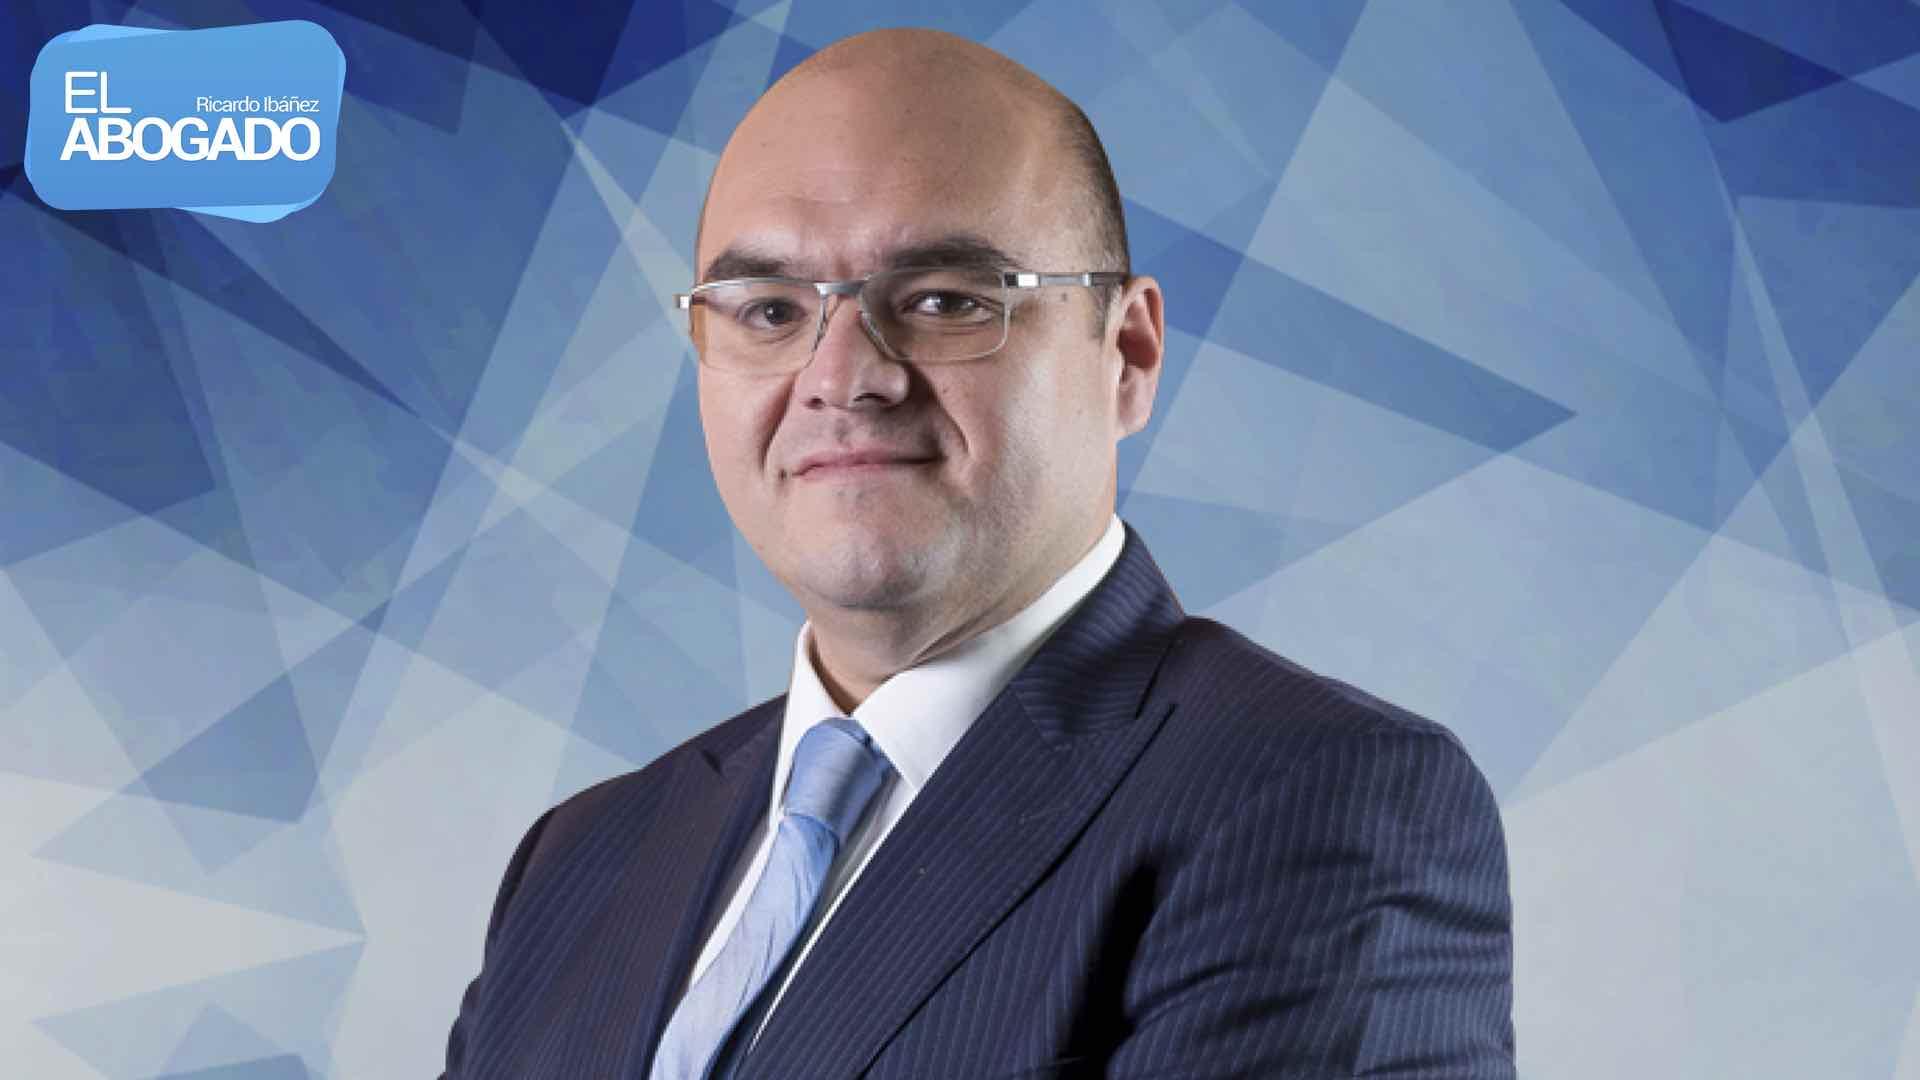 El Abogado con Ricardo Ibáñez